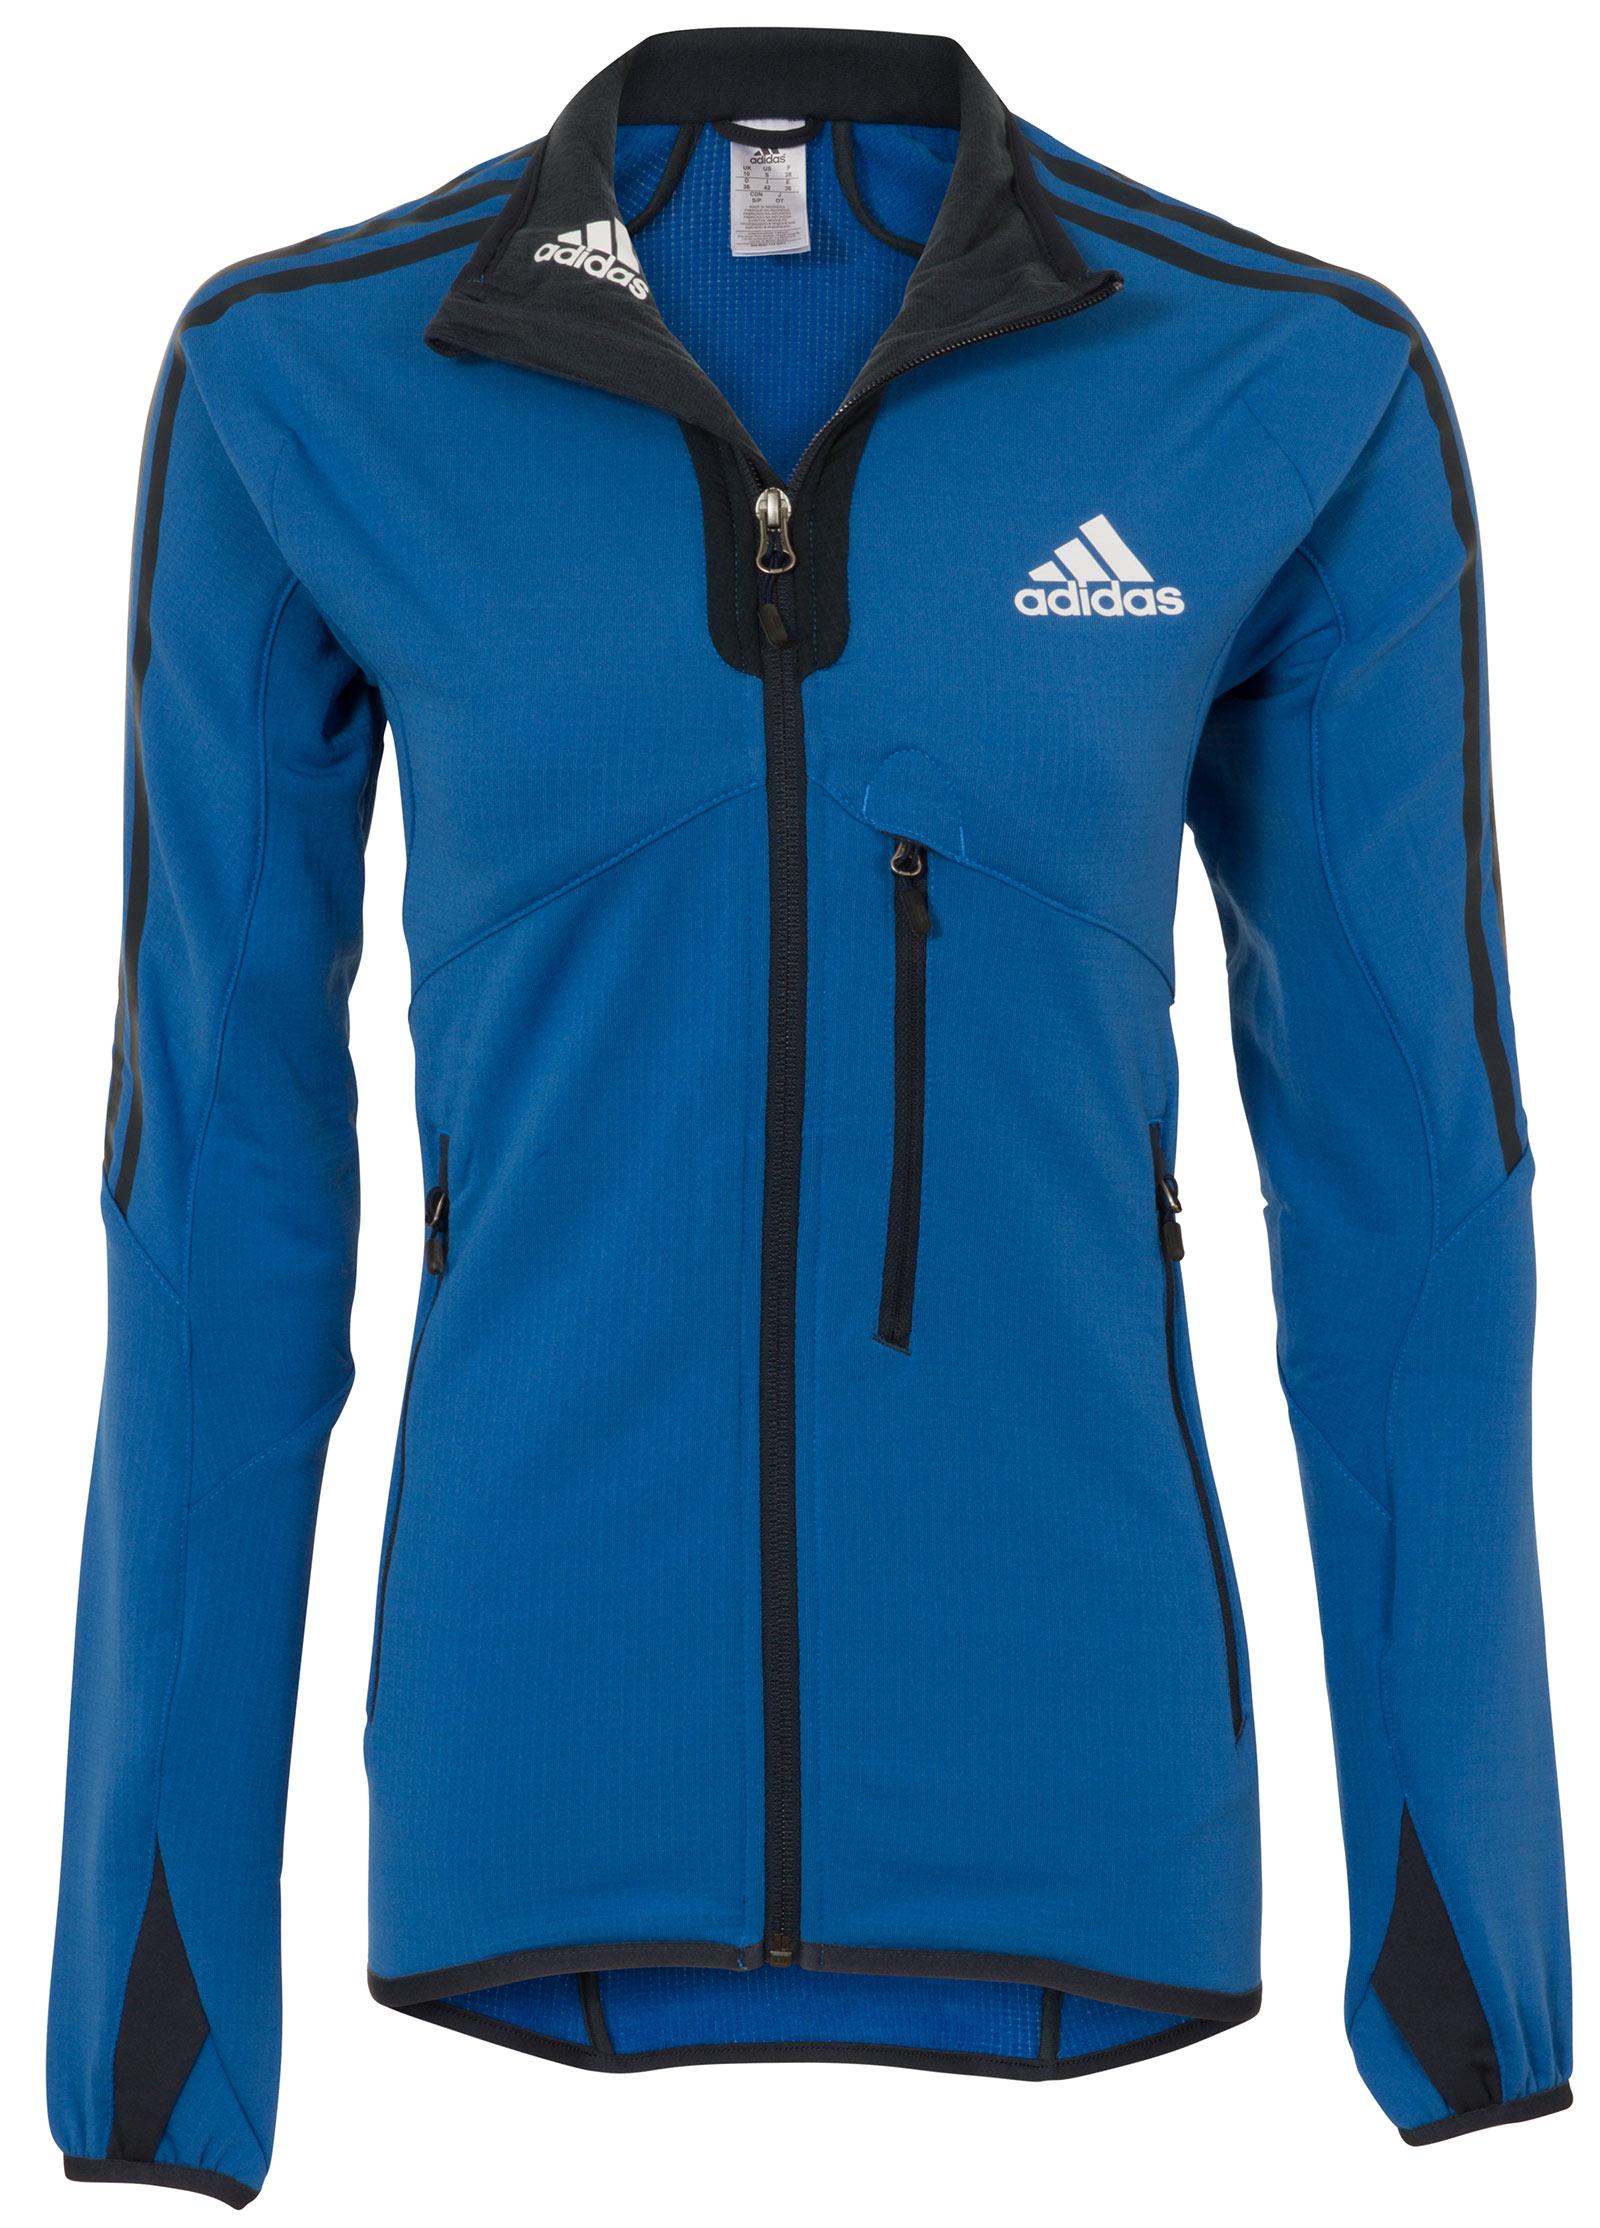 Cross Country Skiing Clothing Womens Uk